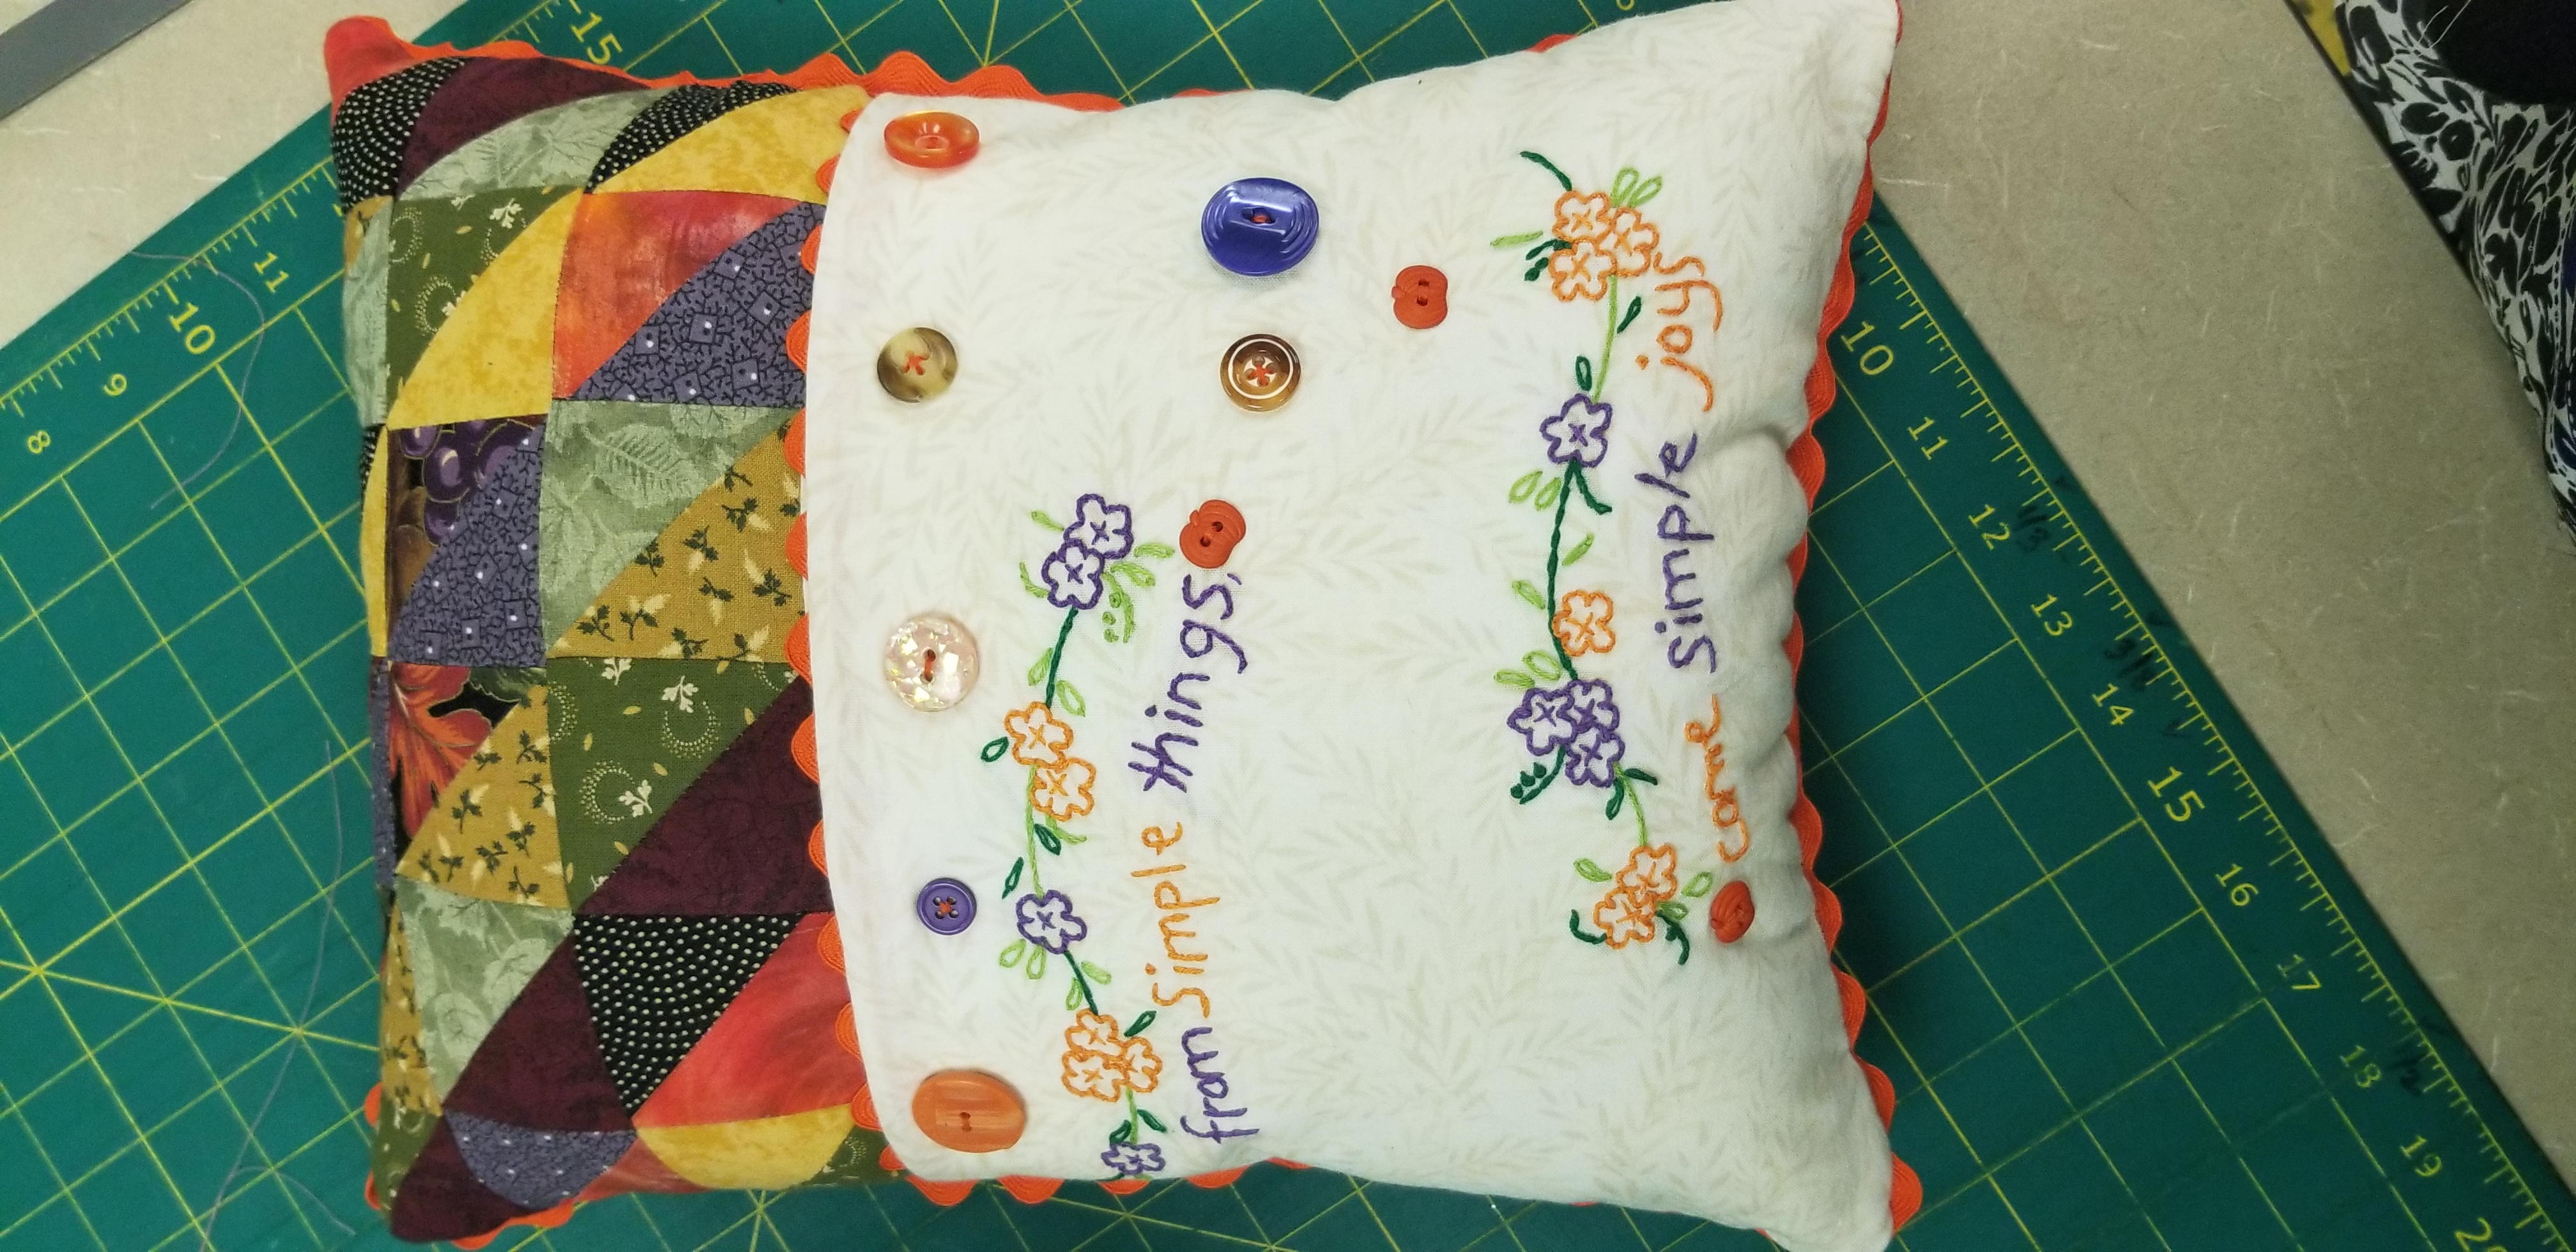 Simple Joy Pillow  - 3 of 3